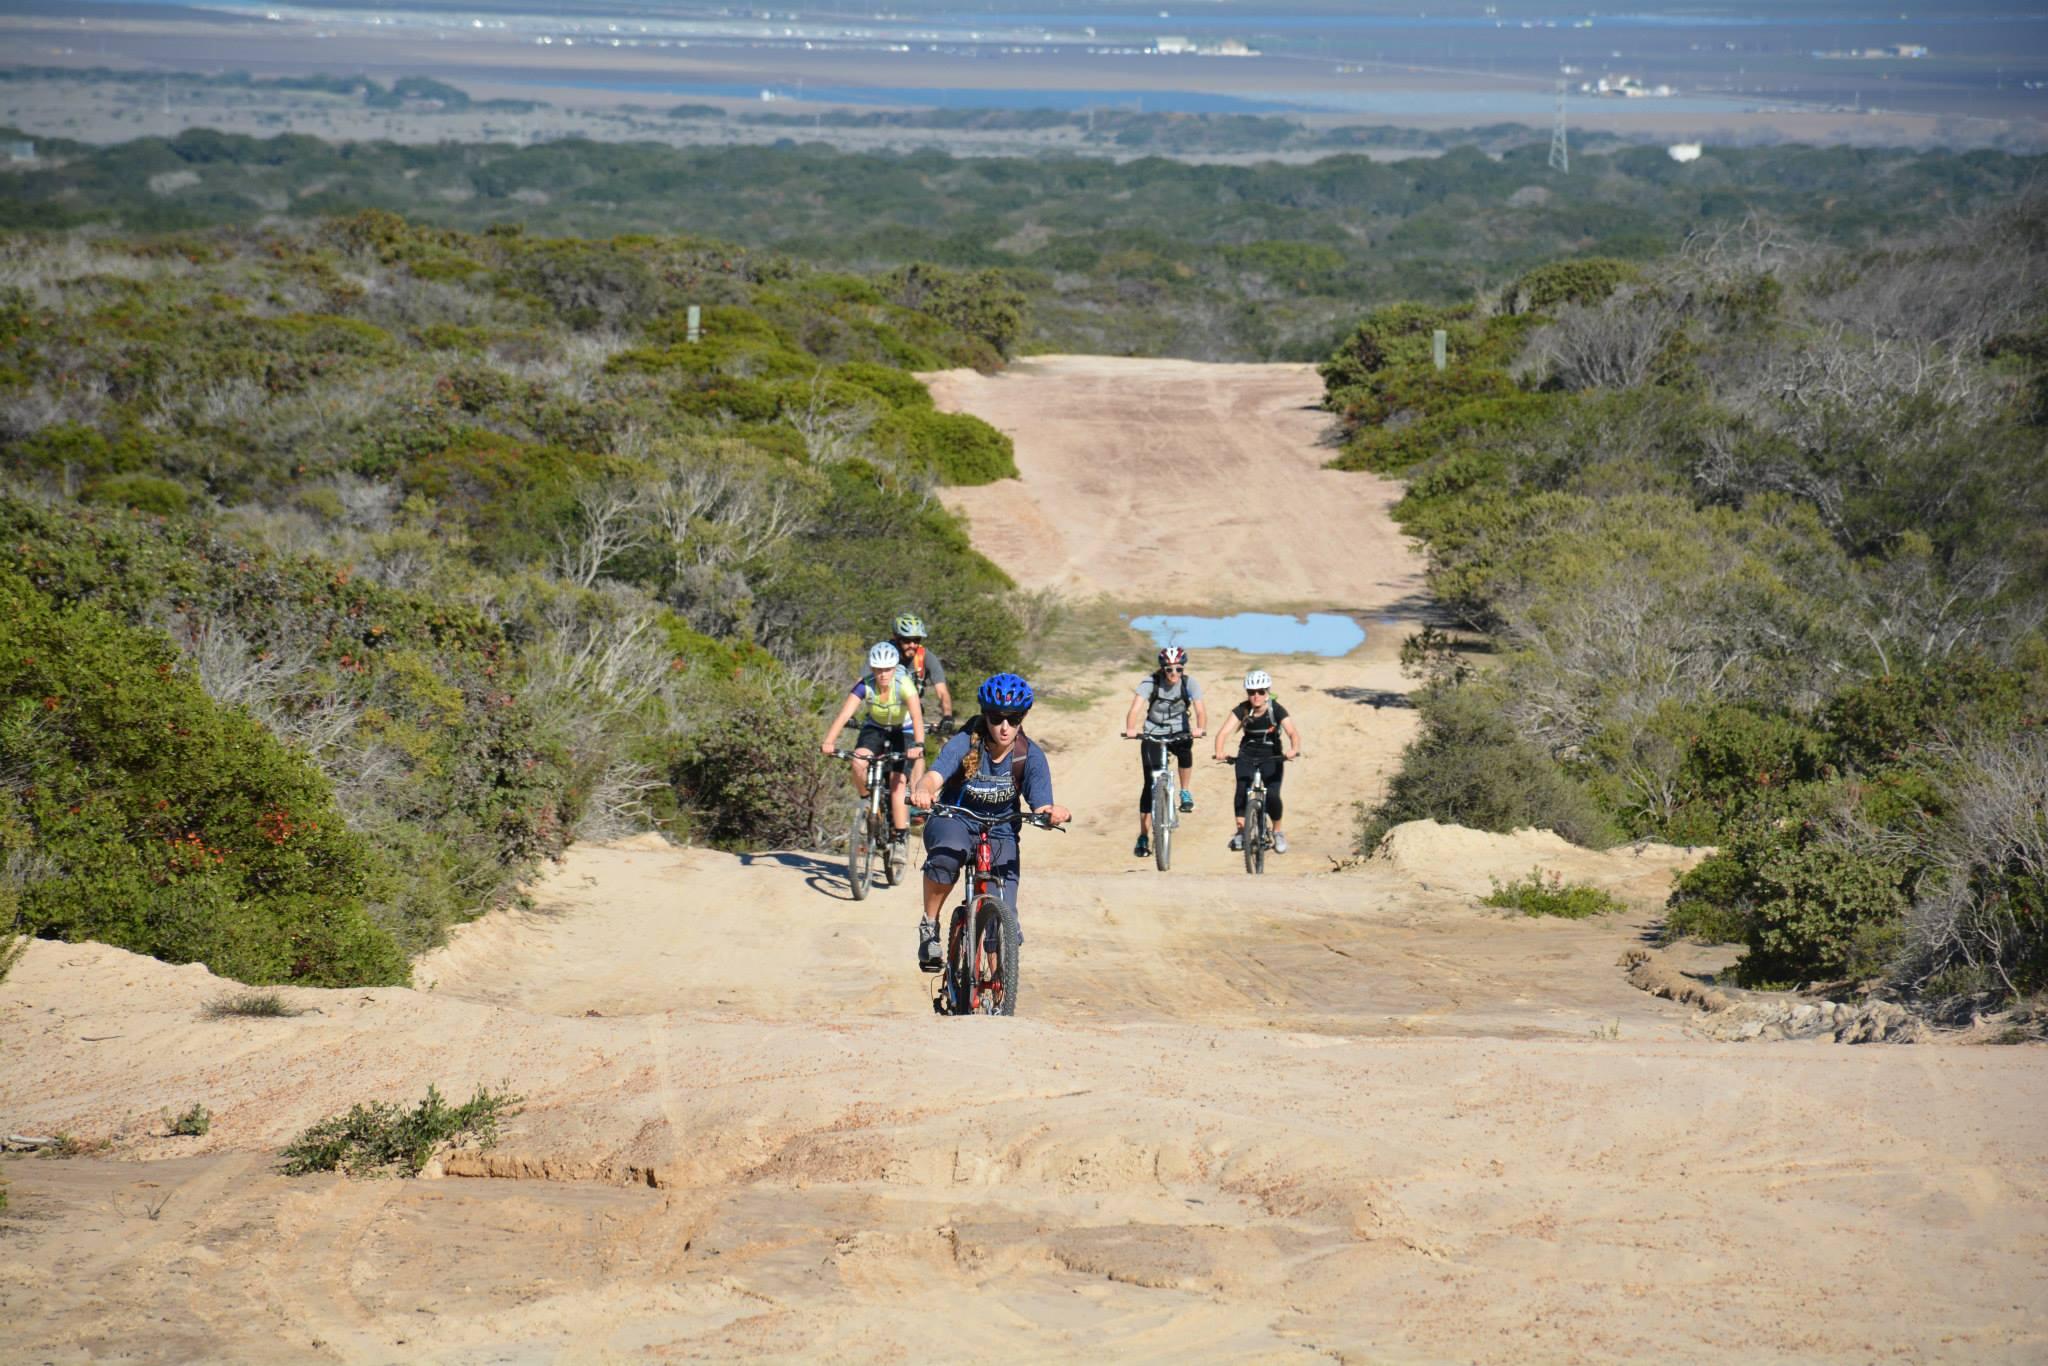 Mountain biking on Fort Ord